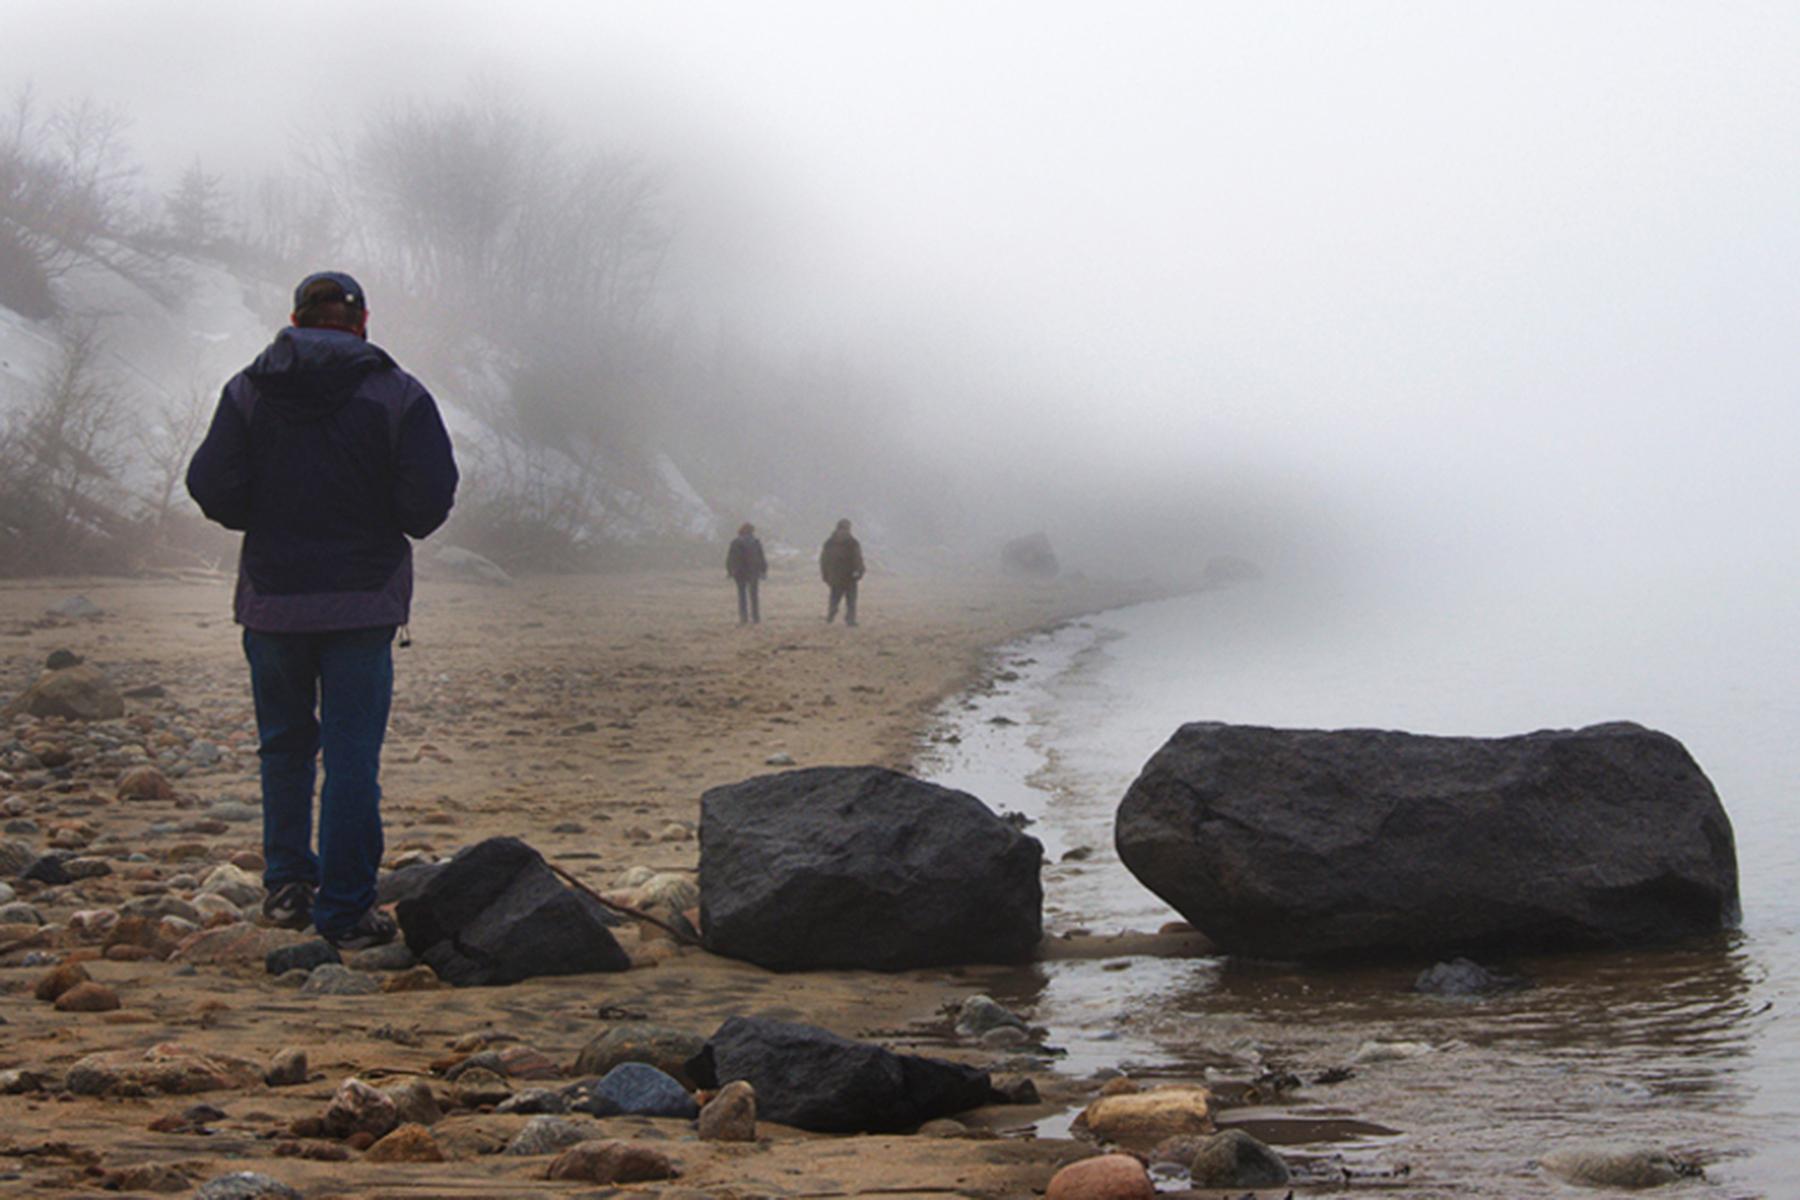 Promenade sur la plage brumeuse